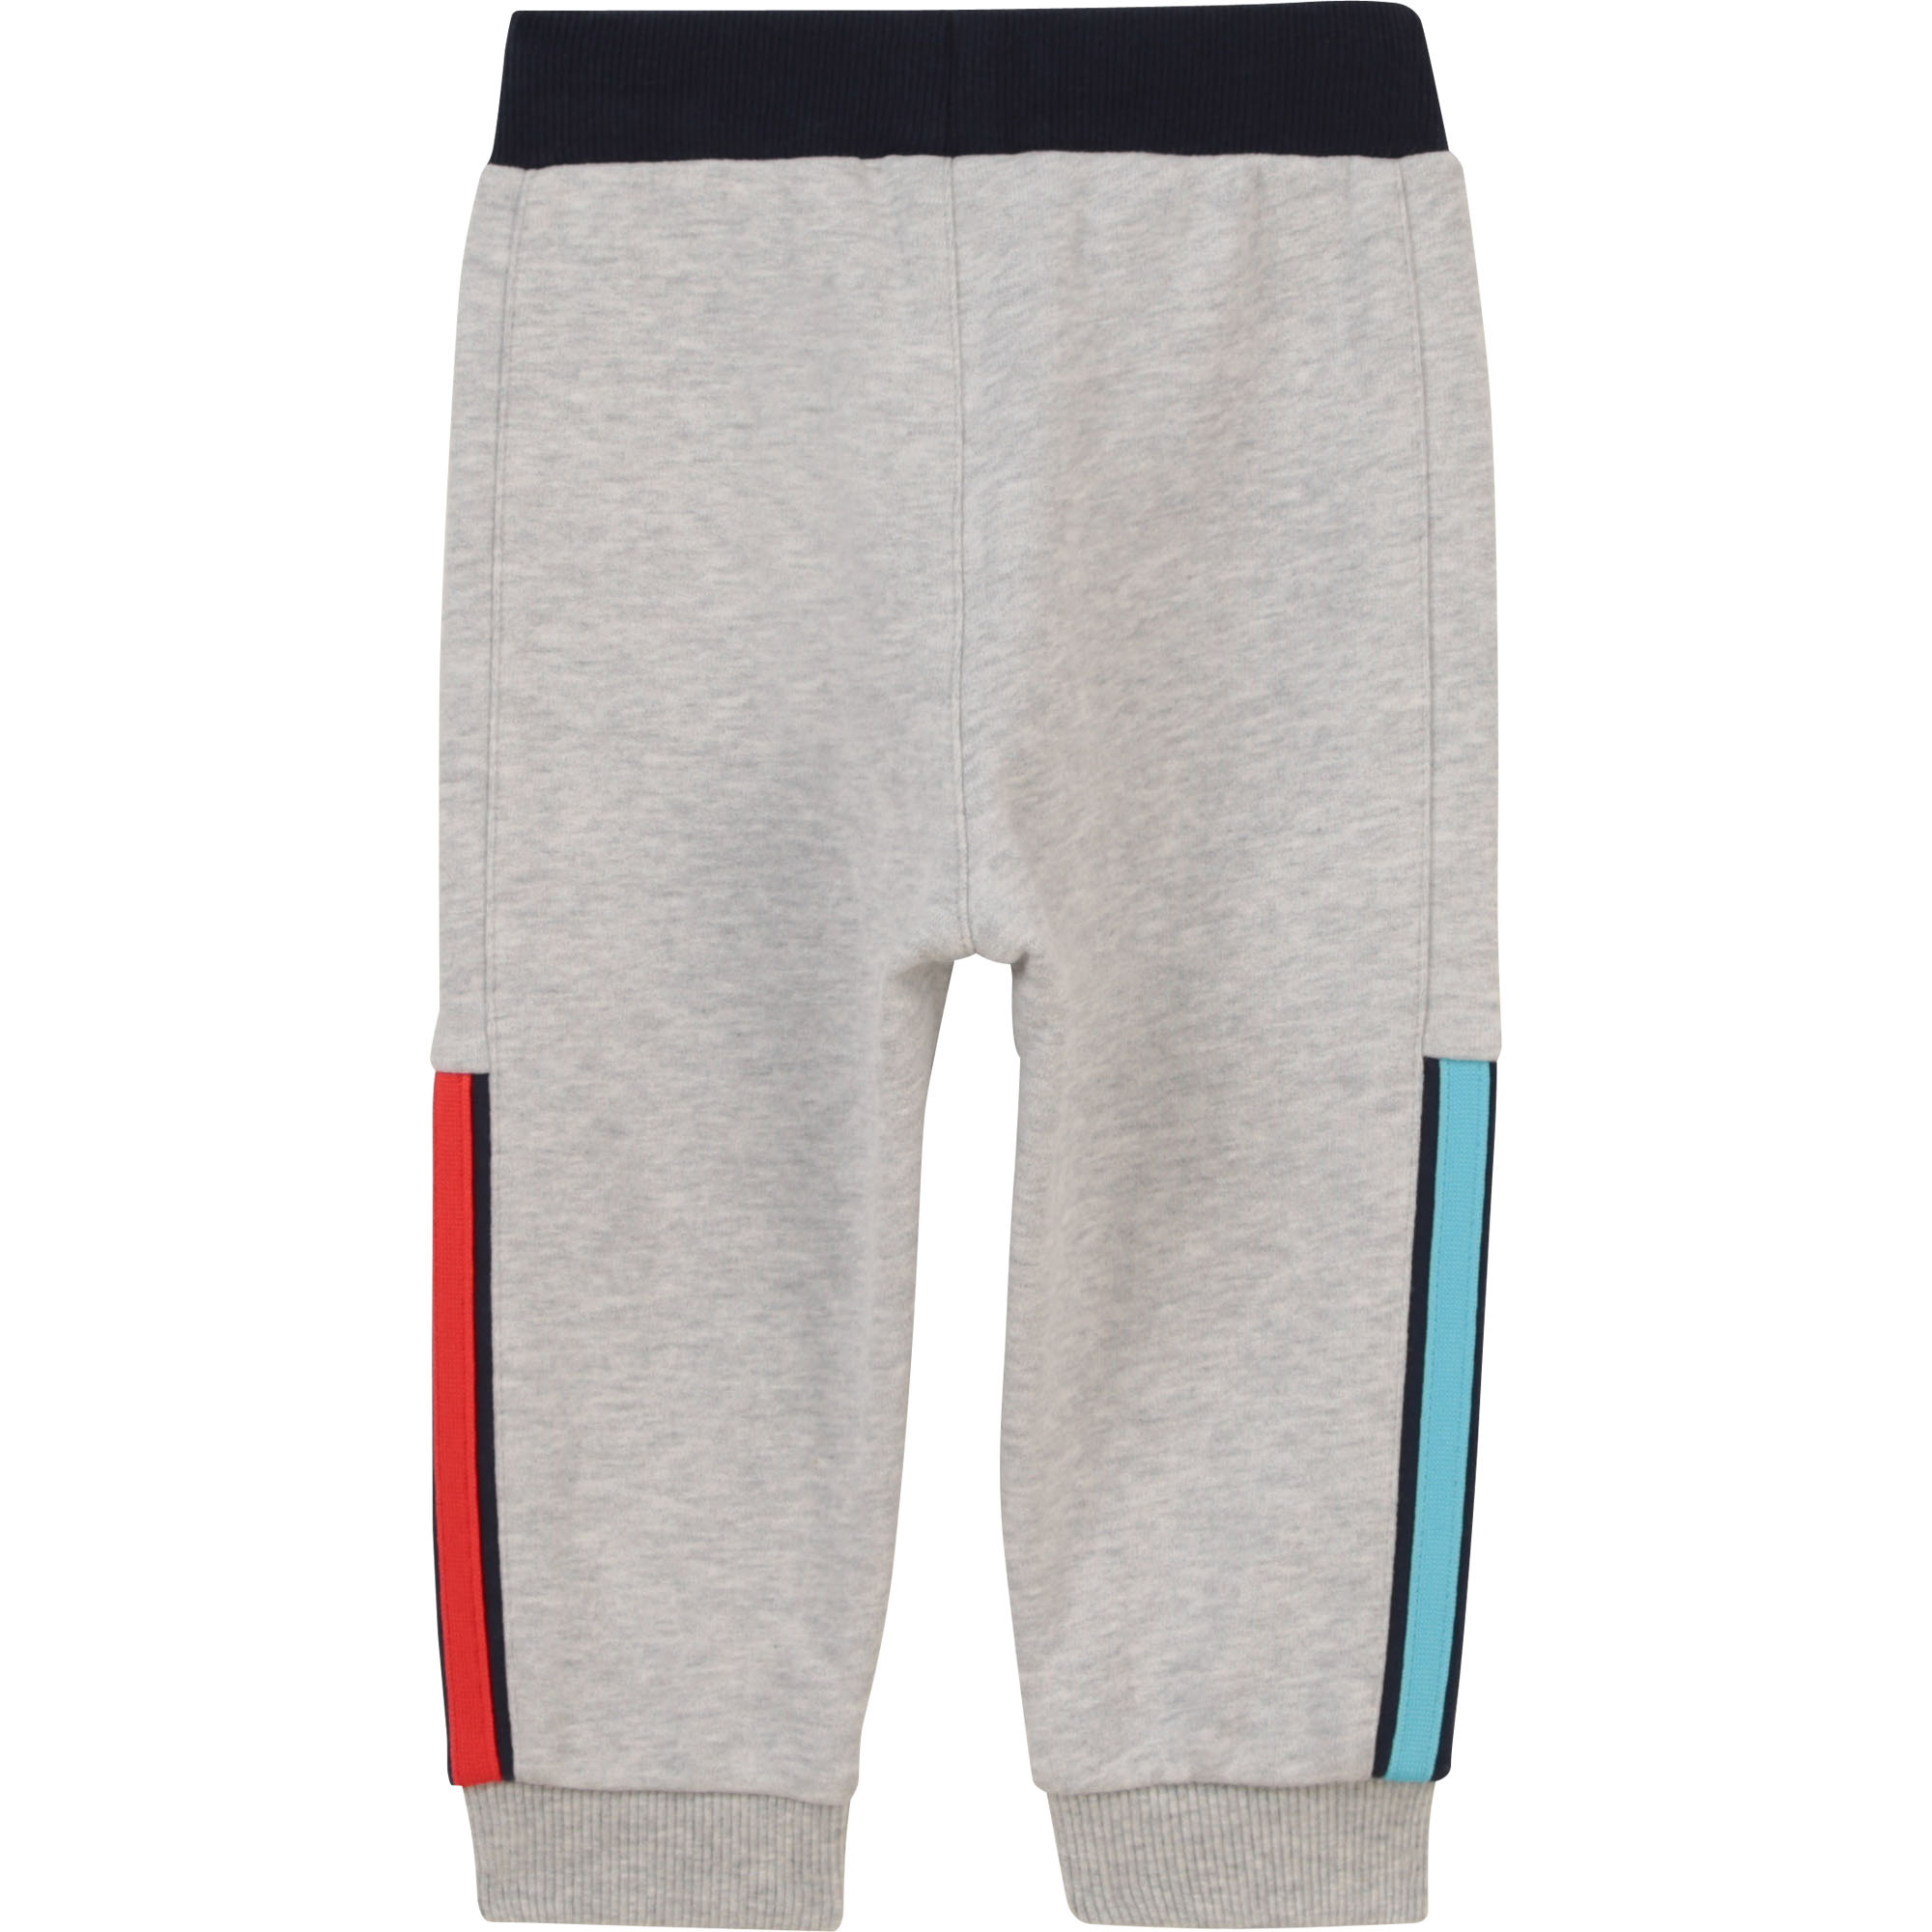 Pantalon de jogging TIMBERLAND pour GARCON